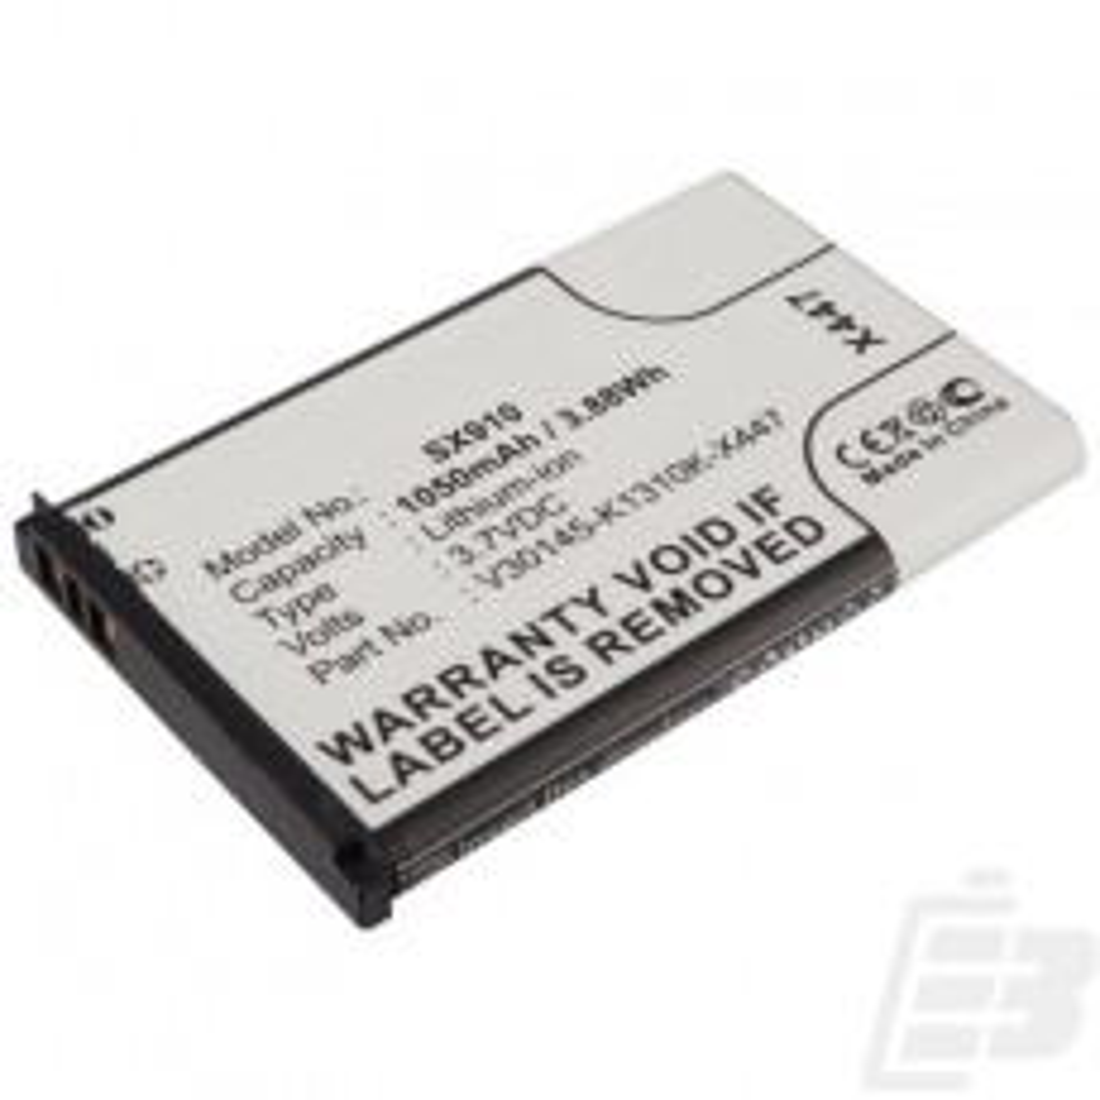 Cordless phone battery Siemens Gigaset SL910H_1